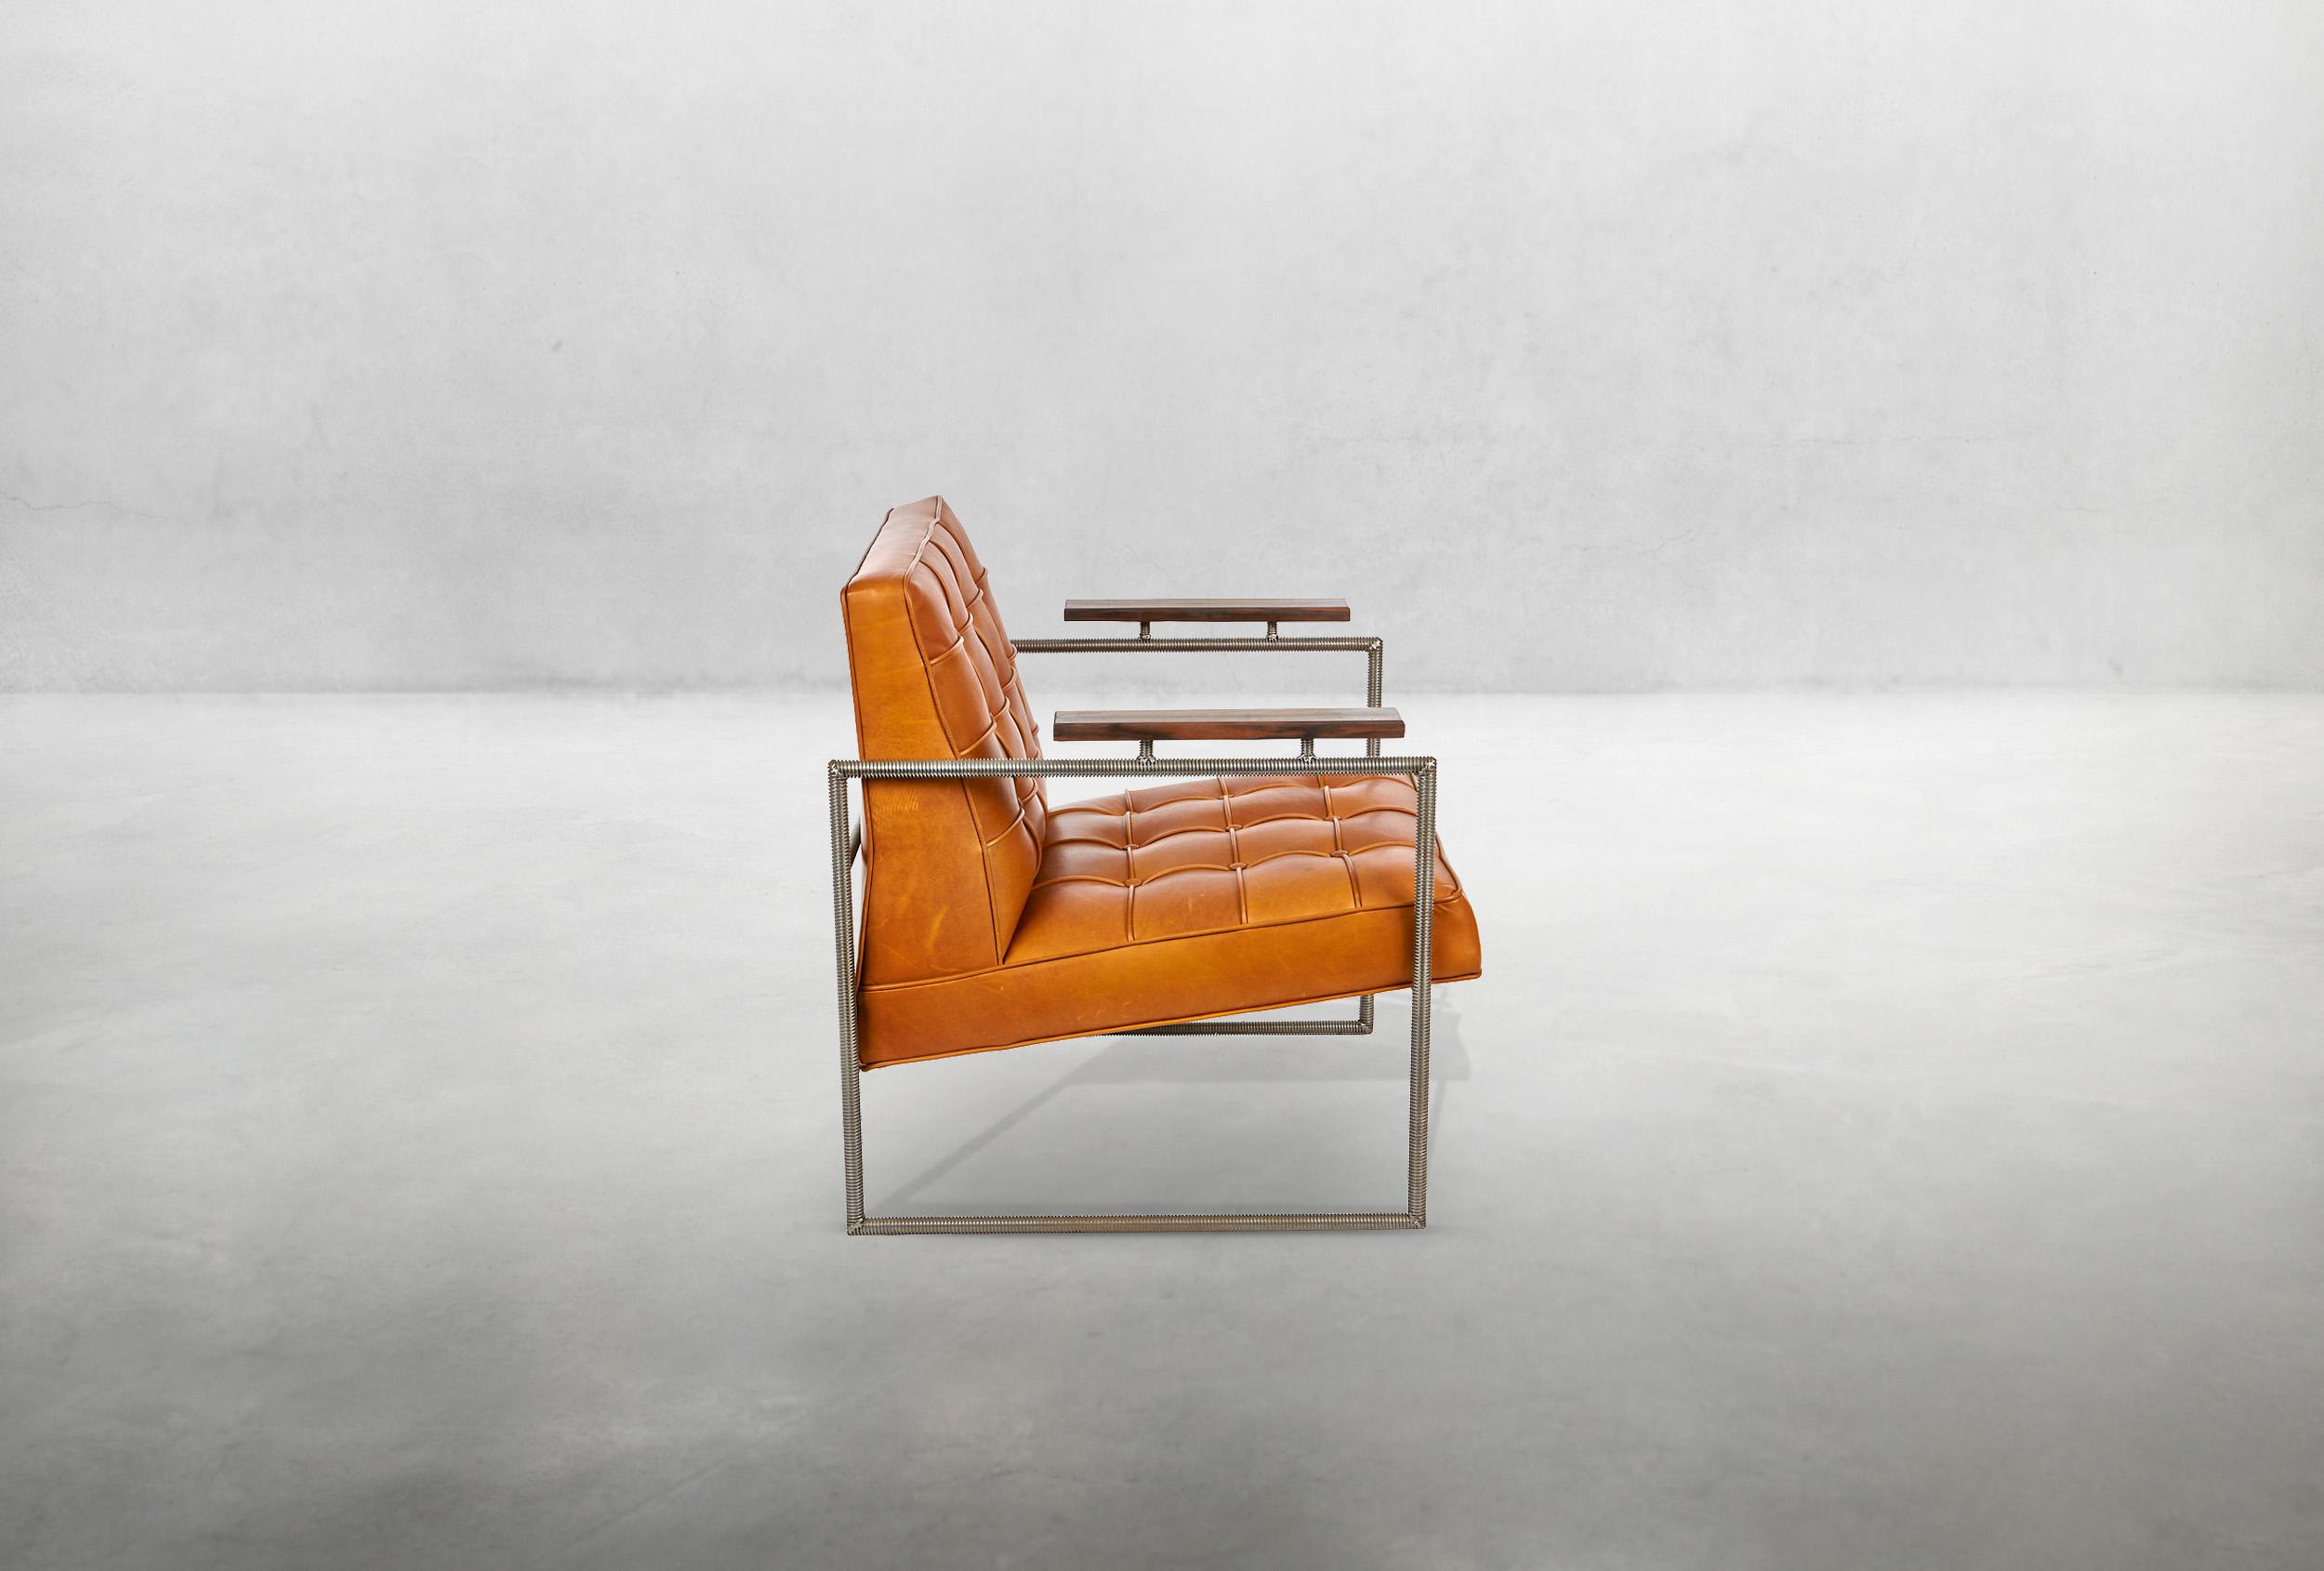 1935 Chair Brown Leather 03 richard velloso olga guanabara title.jpg